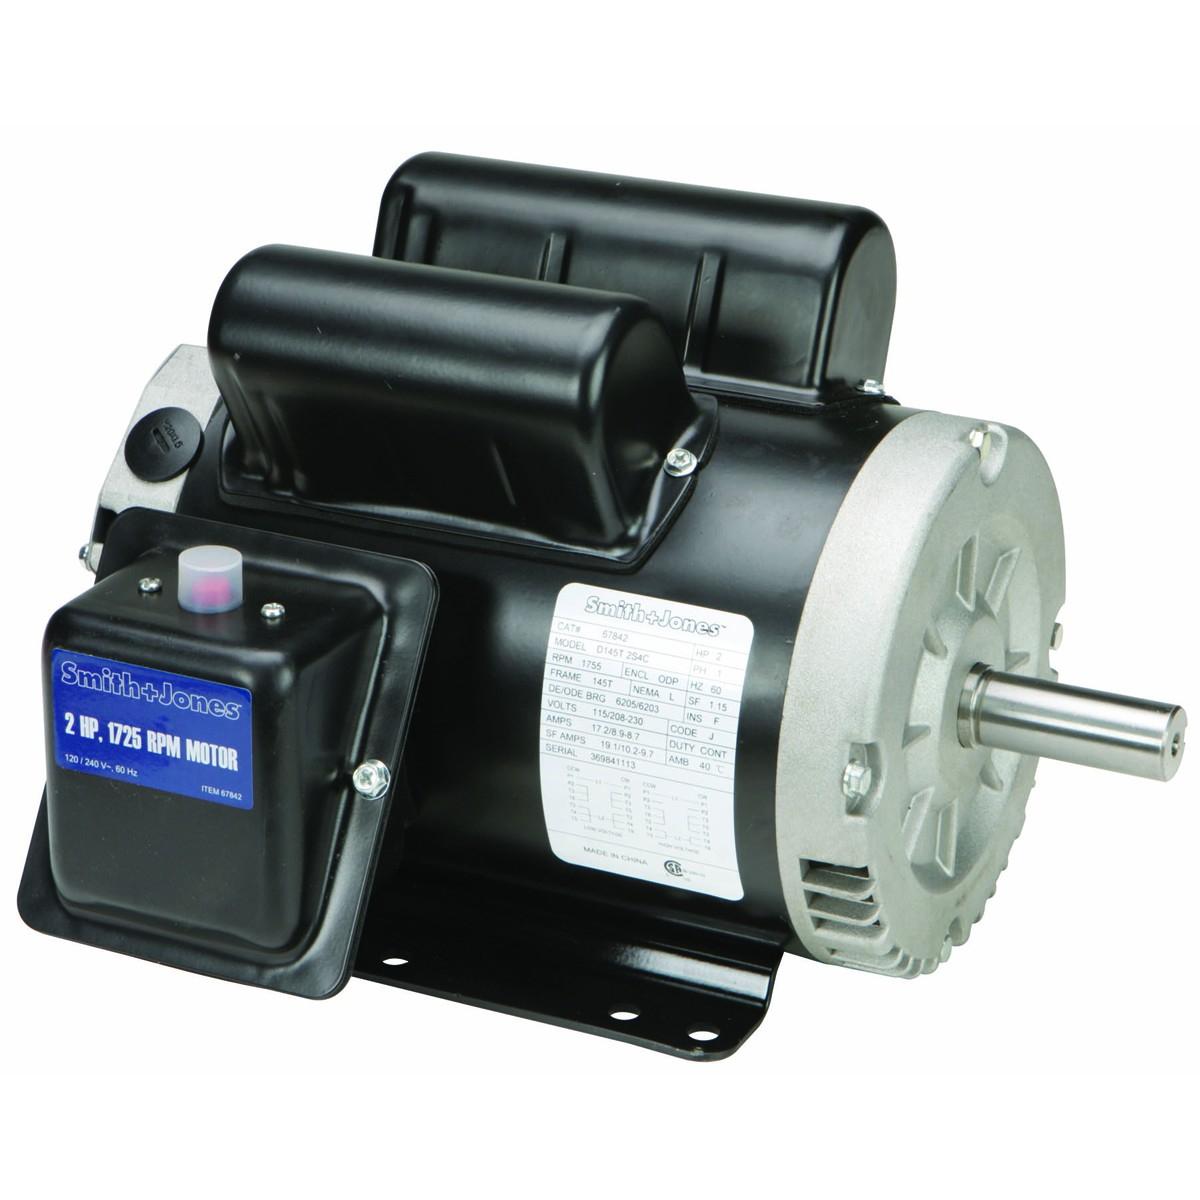 2 Hp Compressor Duty Motor - Smith And Jones Electric Motors Wiring Diagram